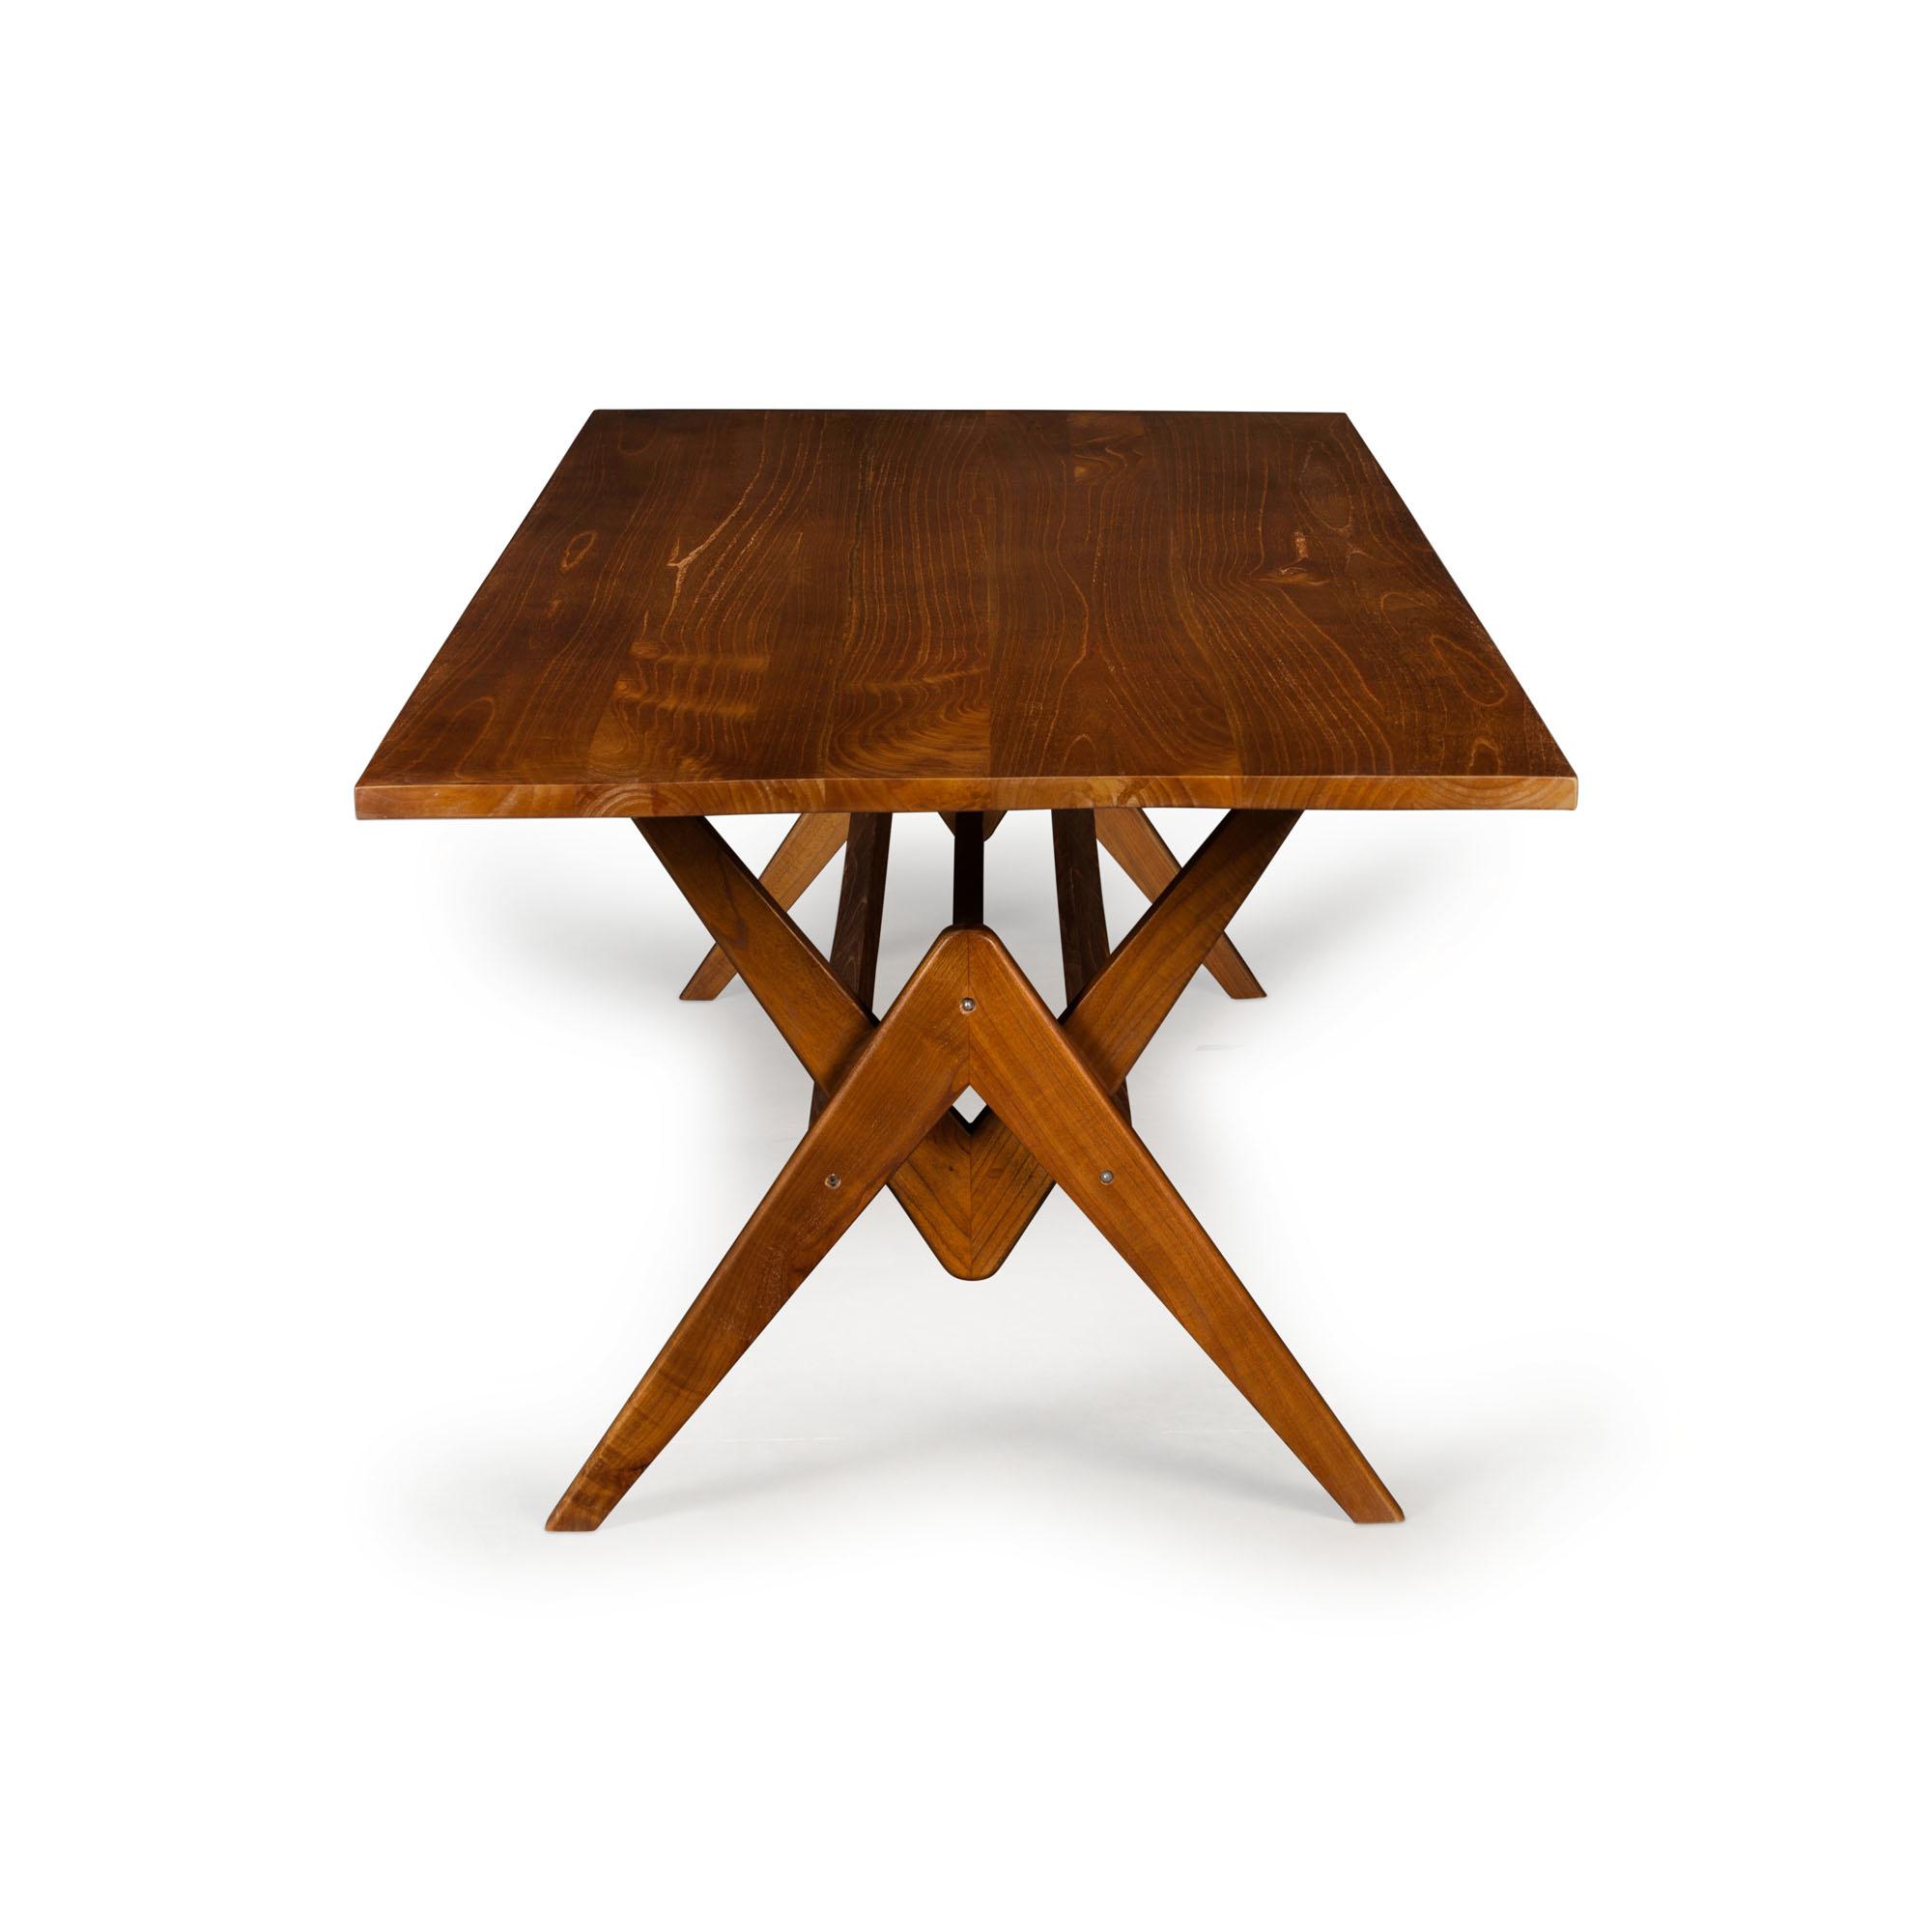 Dining Table W.T.H. 220 - Verdunkeltes Teakholz-1